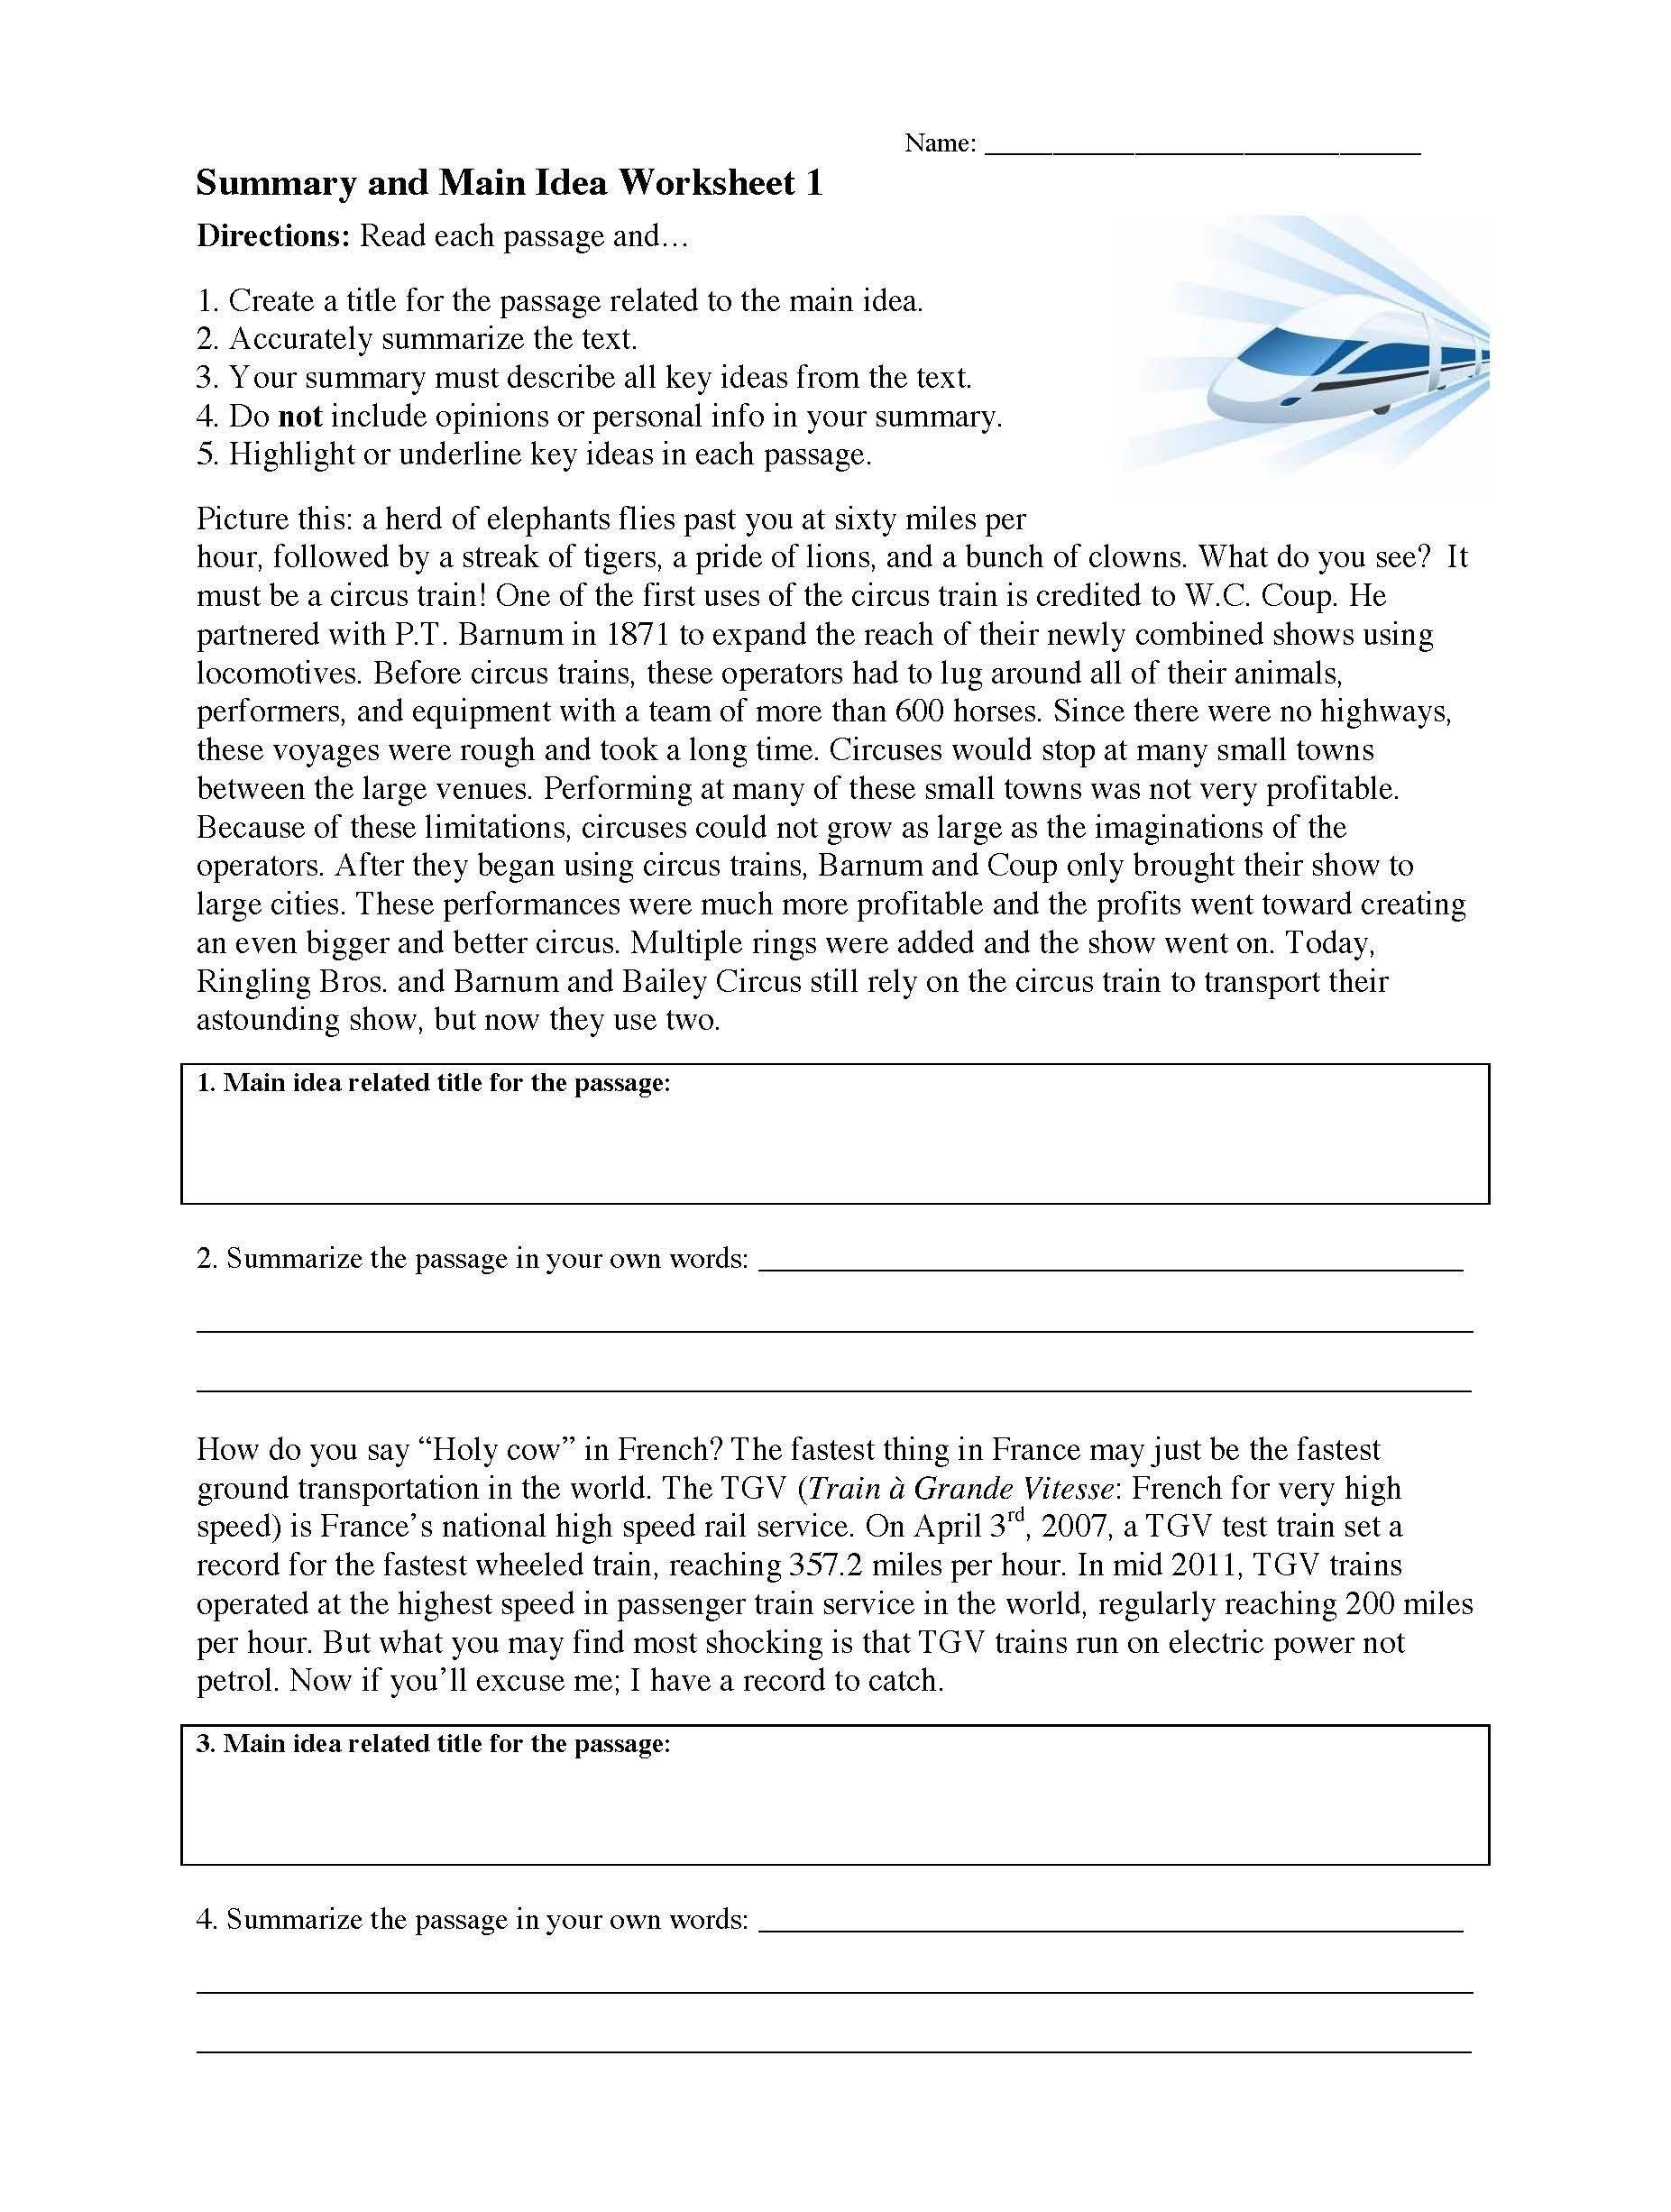 Main Idea Fourth Grade Worksheets Summarizing Worksheets Learn To Summarize In 2020 Main Idea Worksheet Summarizing Worksheet Worksheet Template